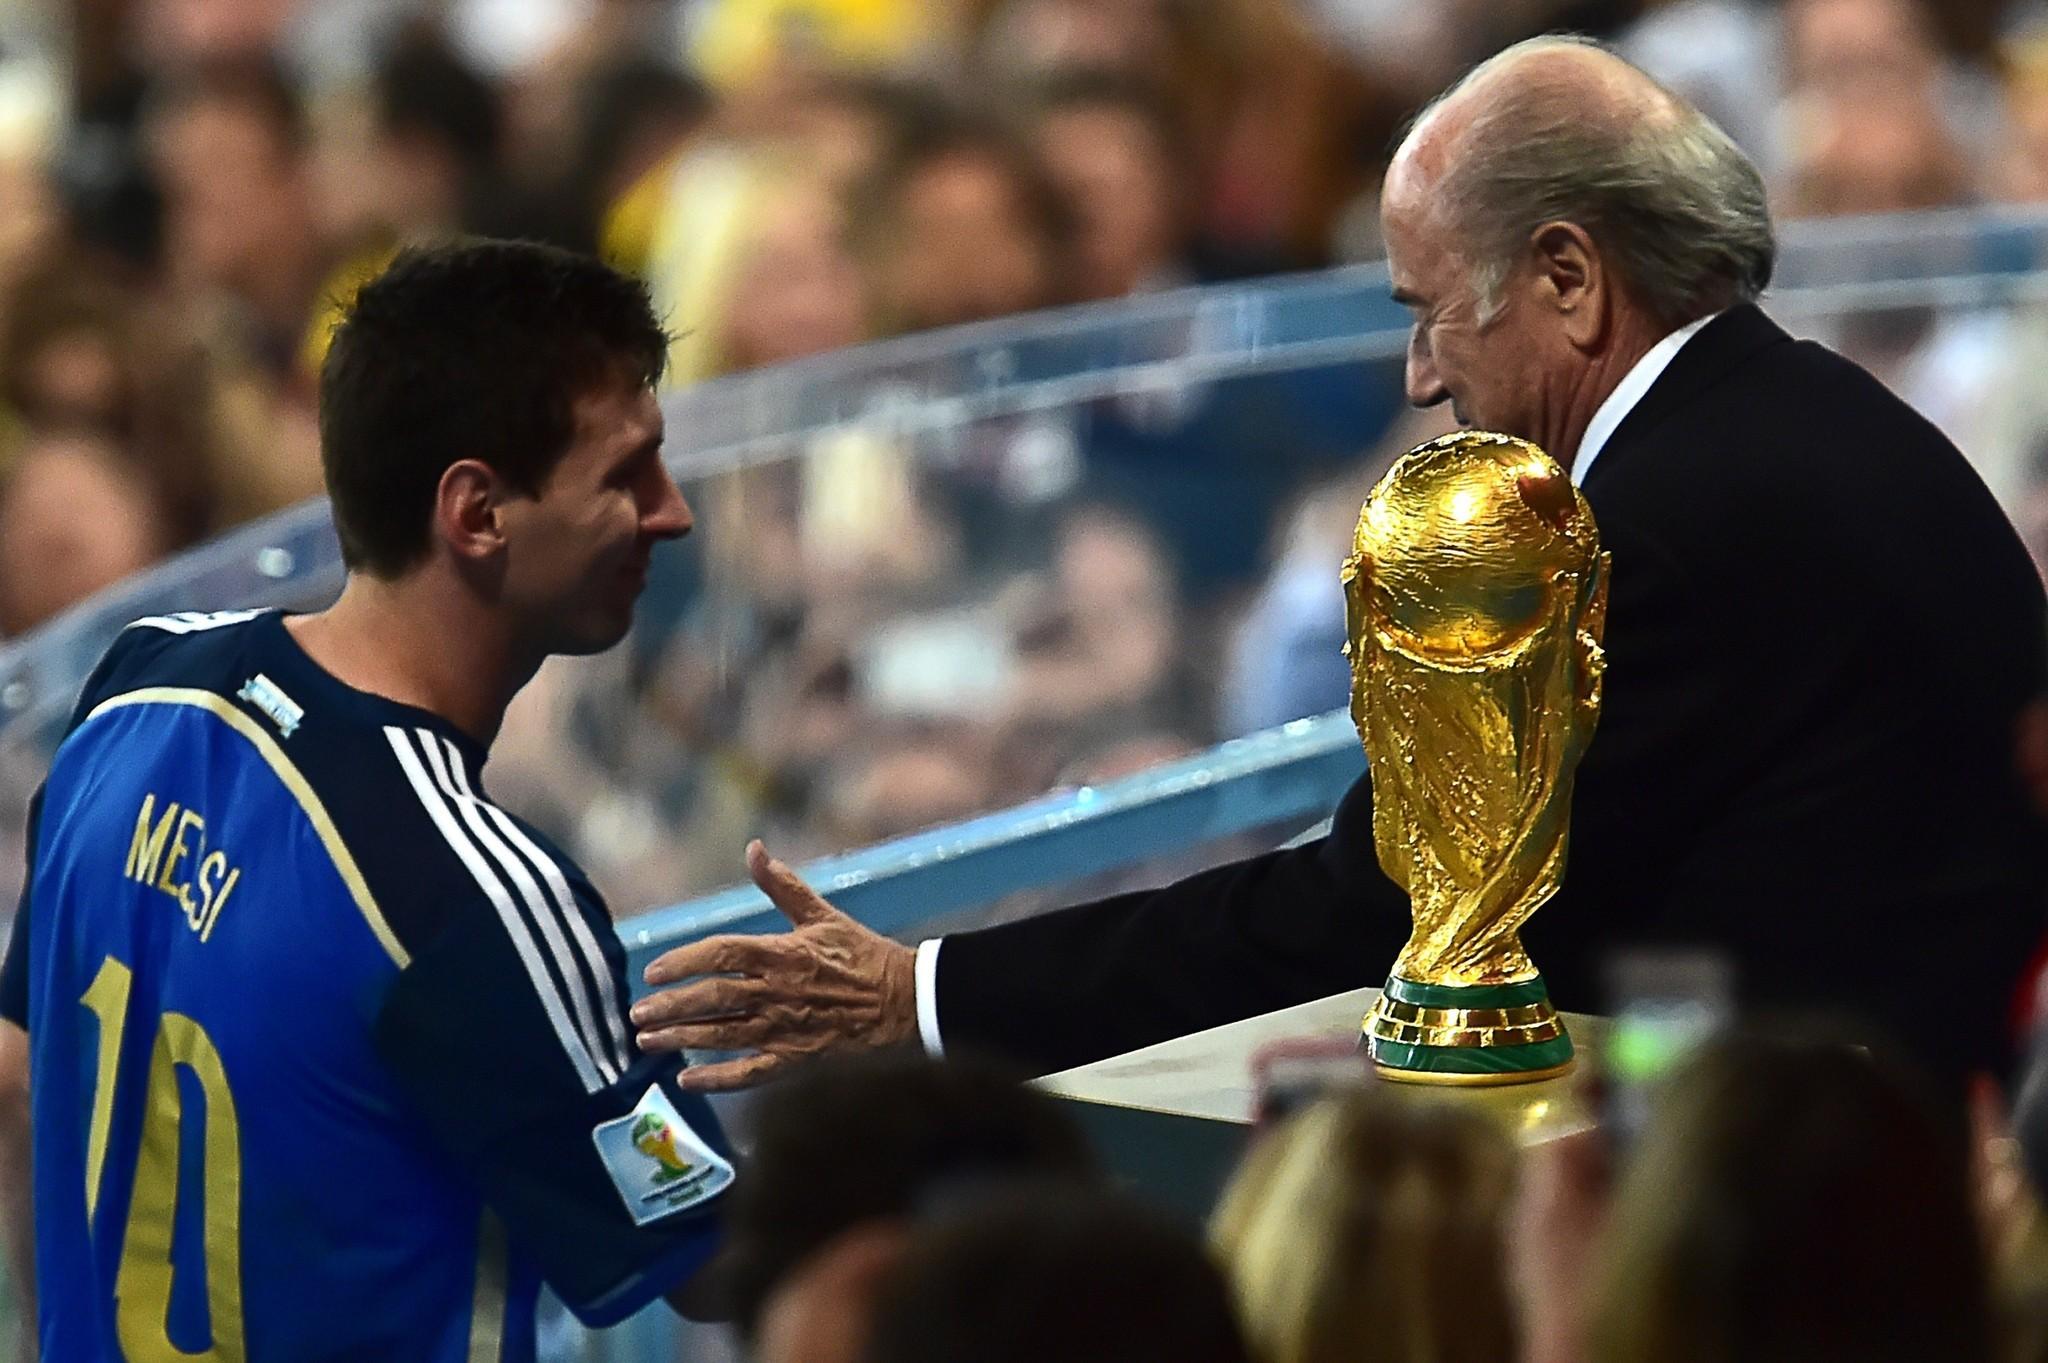 Maradona had no sportsmanship: England goalkeeper